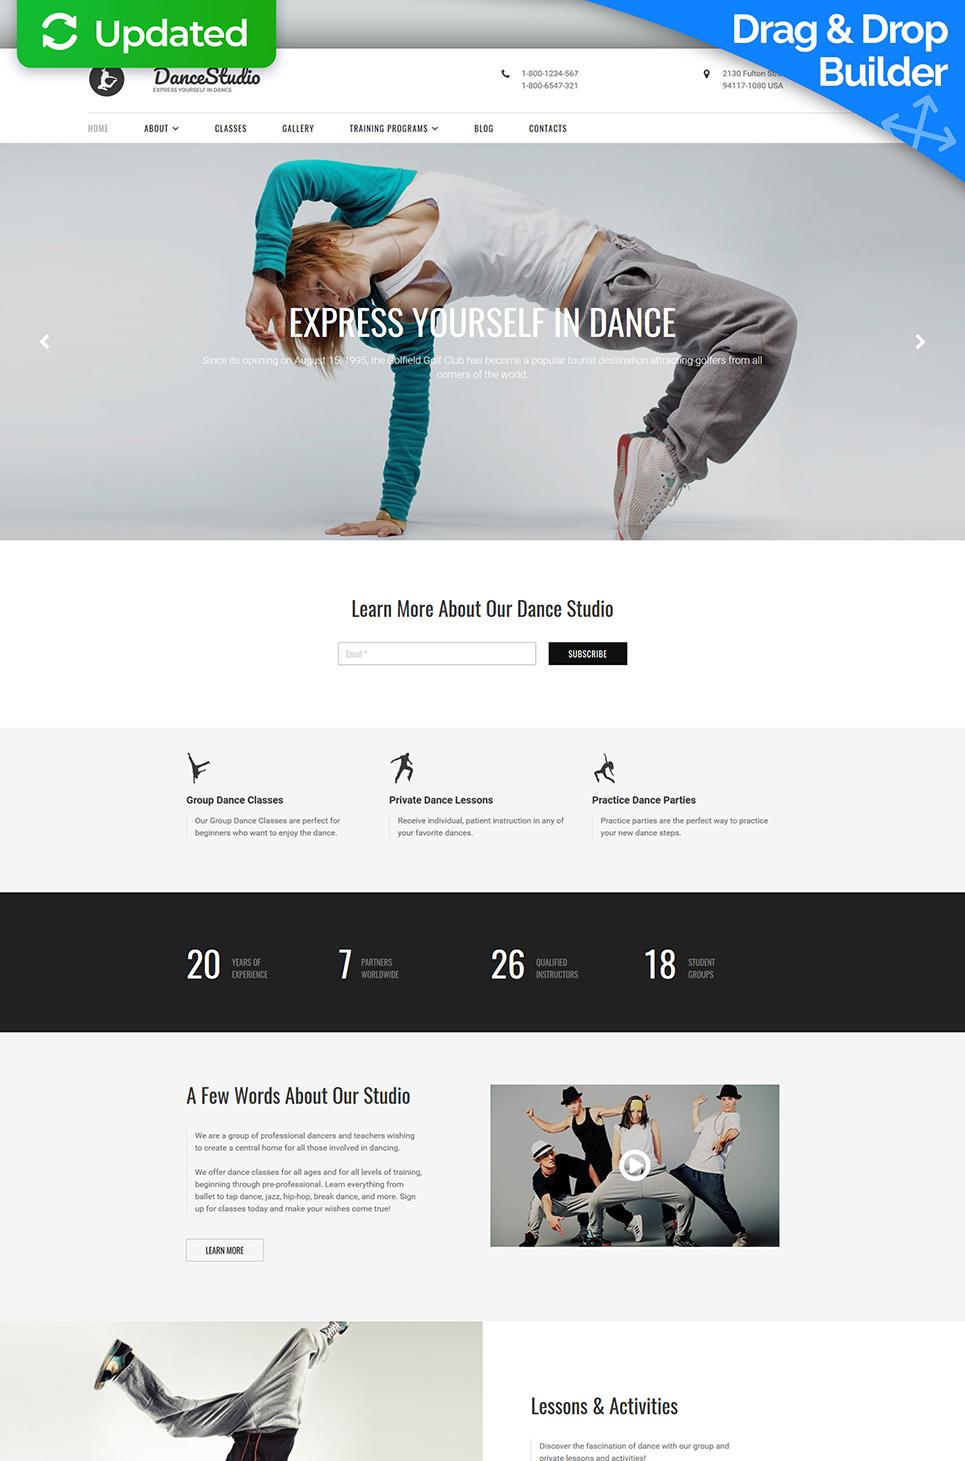 Dance Studio MotoCMS 3 Responsive Template - image